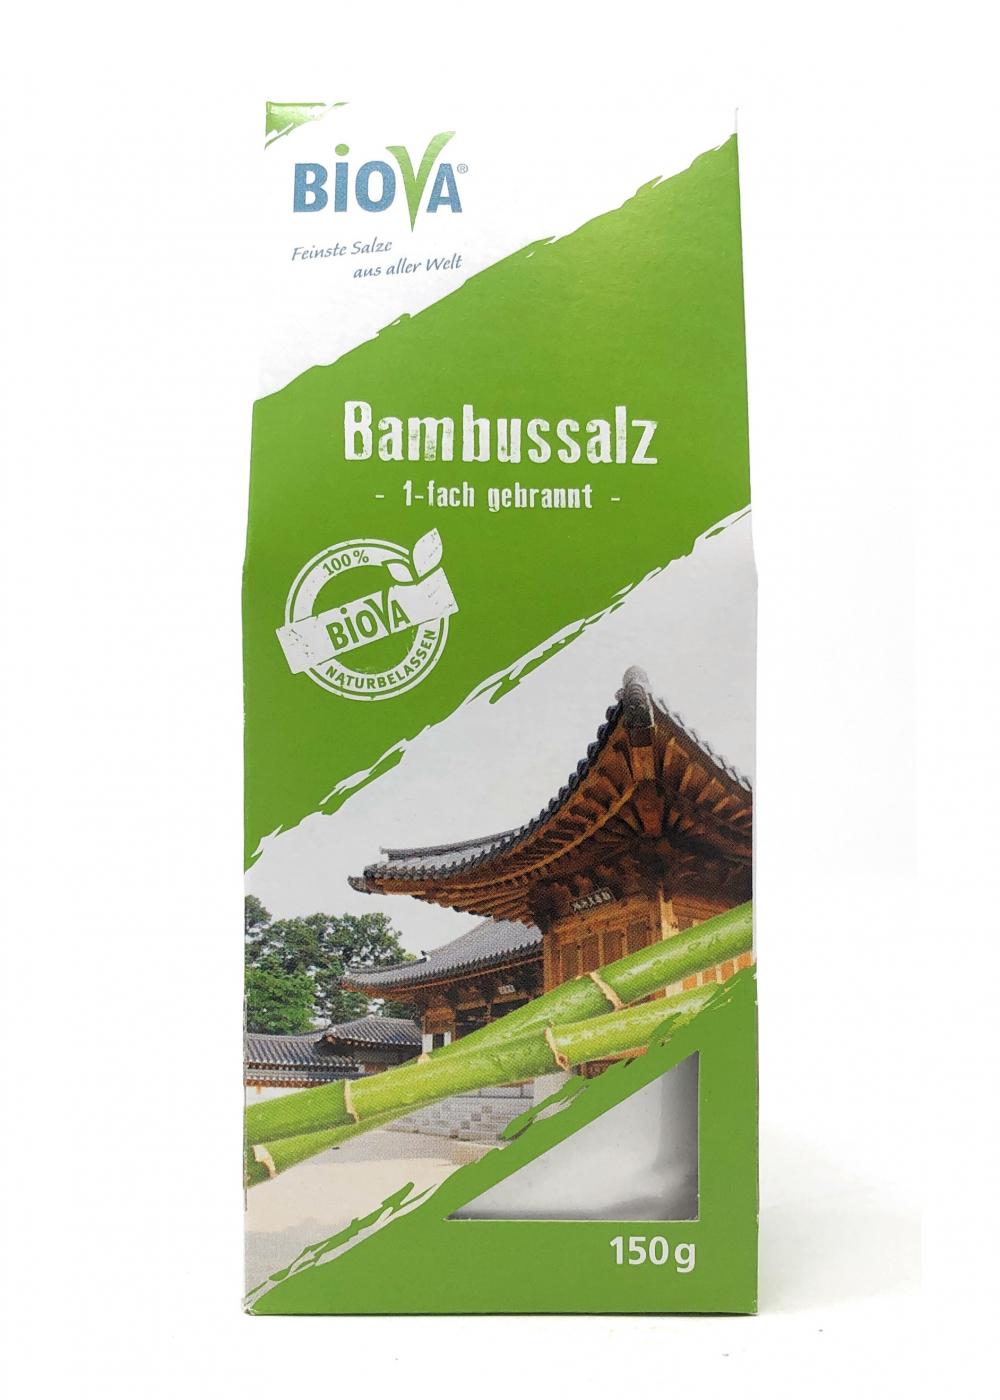 Biova Gourmetsalz Bambussalz (gebranntes Meersalz) aus Korea 150g Faltschachtel